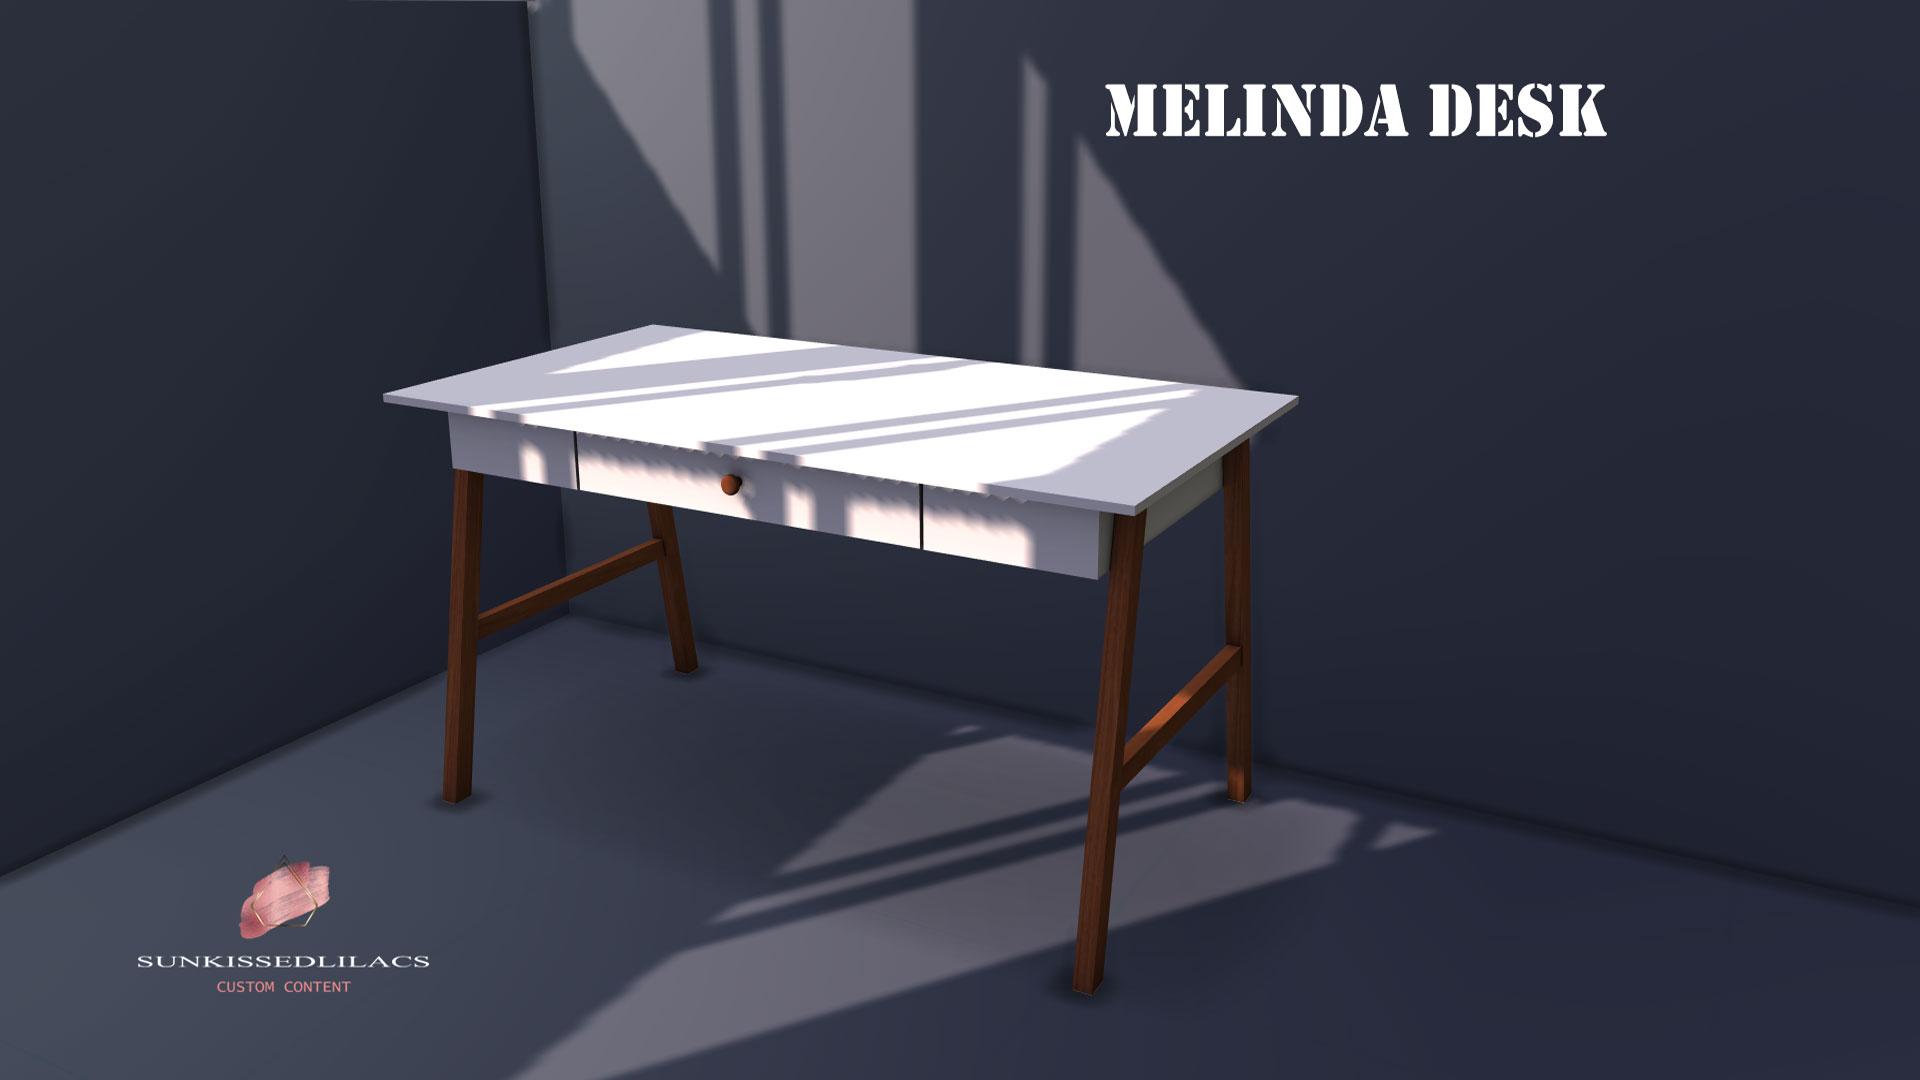 Melinda desk, sunkissedlilacs-simms-4-custom-content